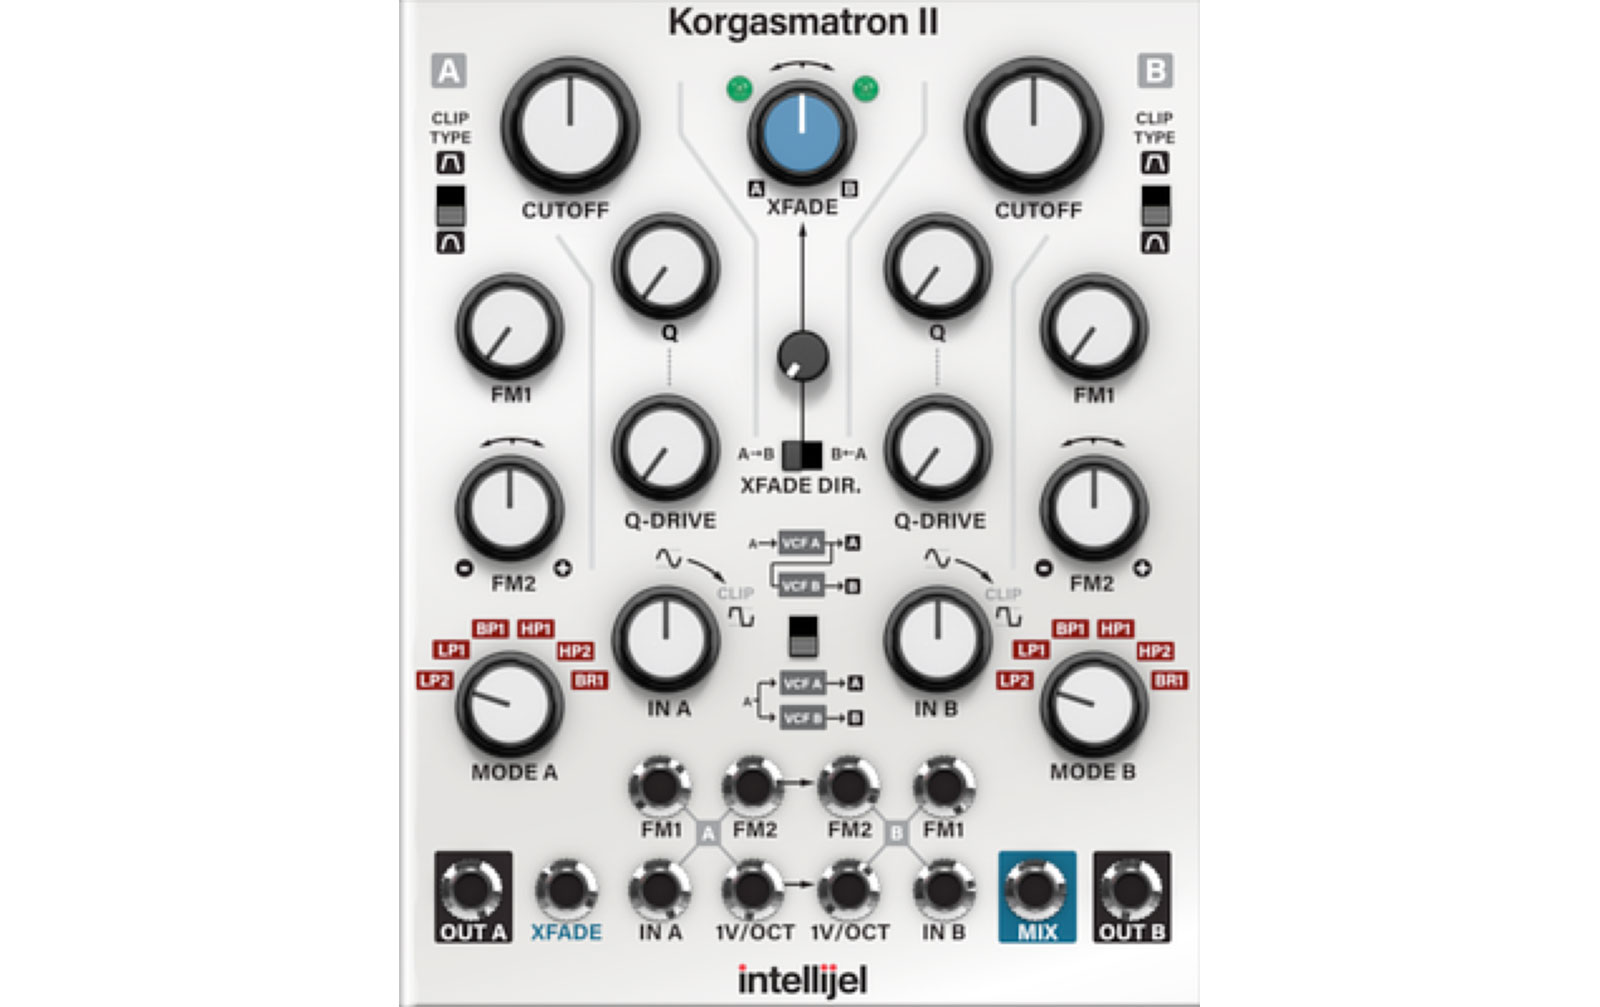 softube-intellijel-korgasmatron-ii-esd-download-